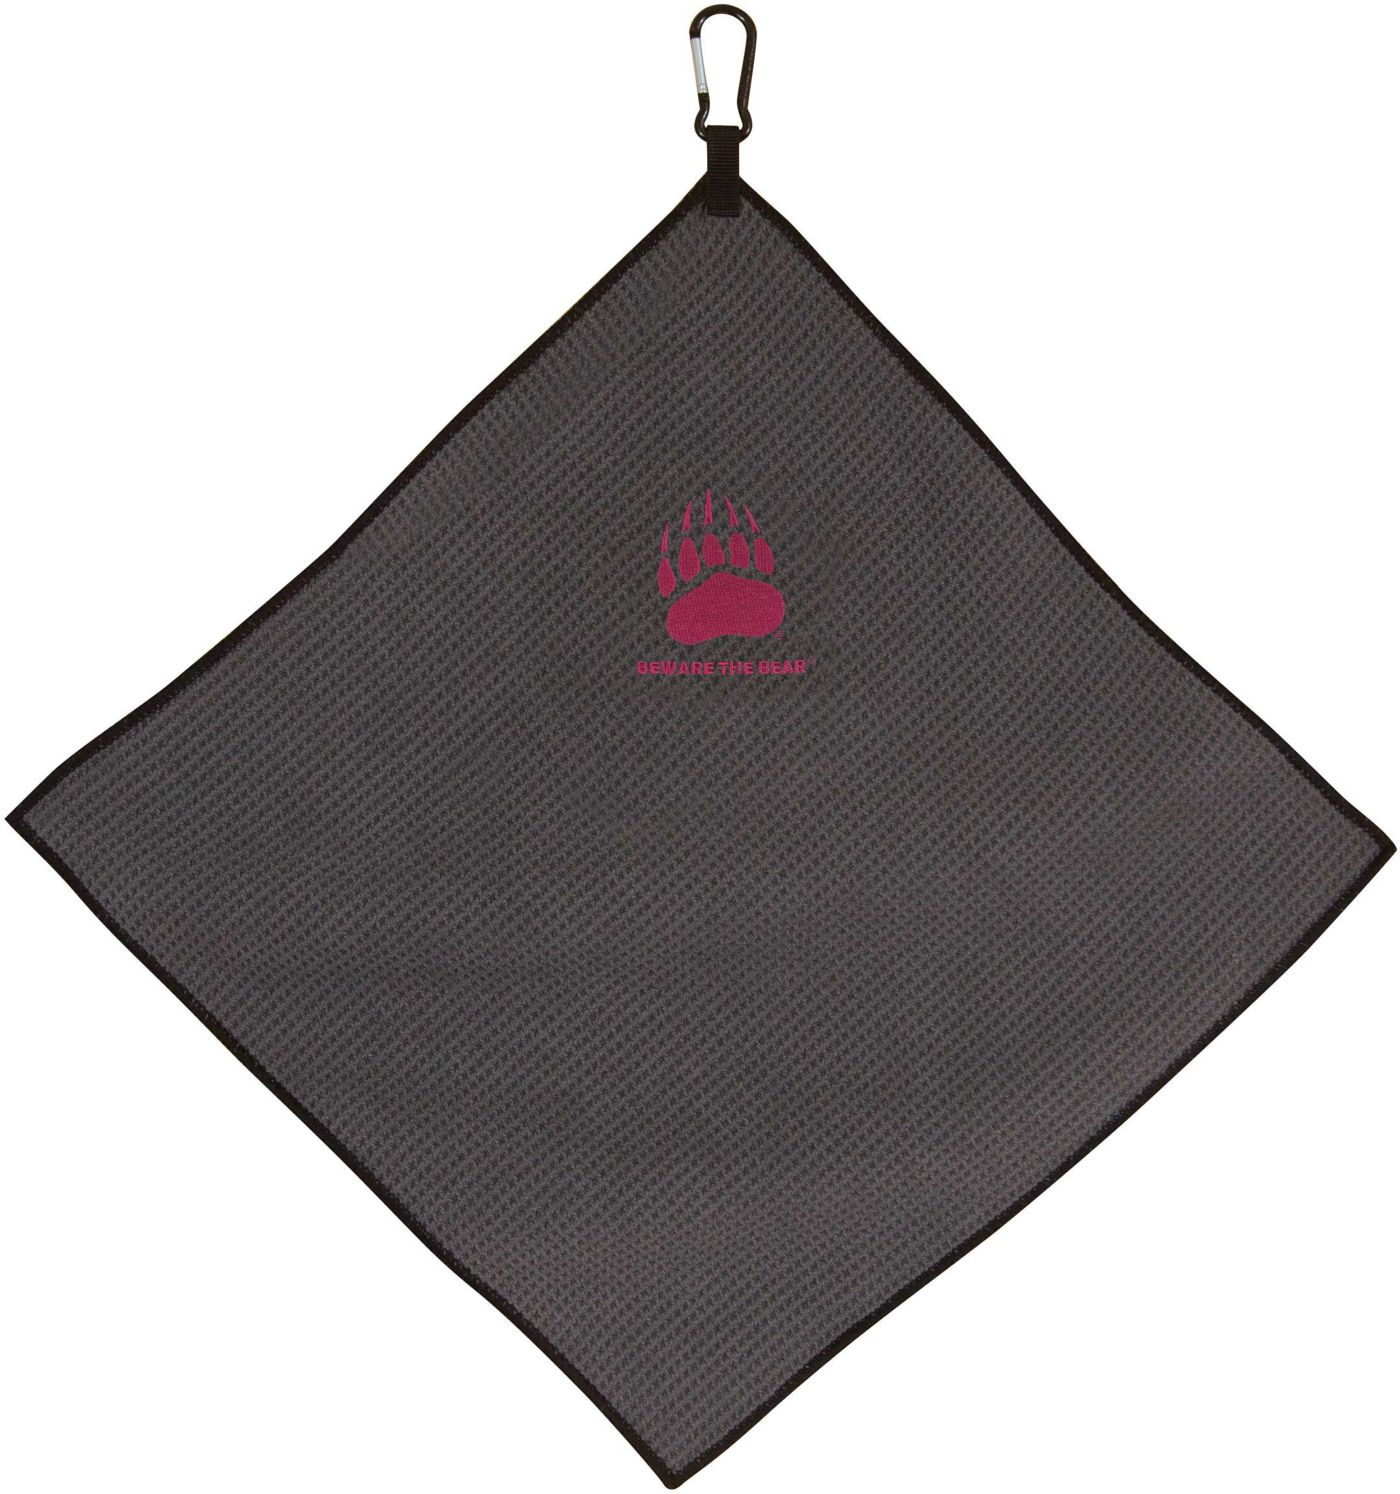 "Team Effort Montana Grizzlies 15"" x 15"" Microfiber Golf Towel"